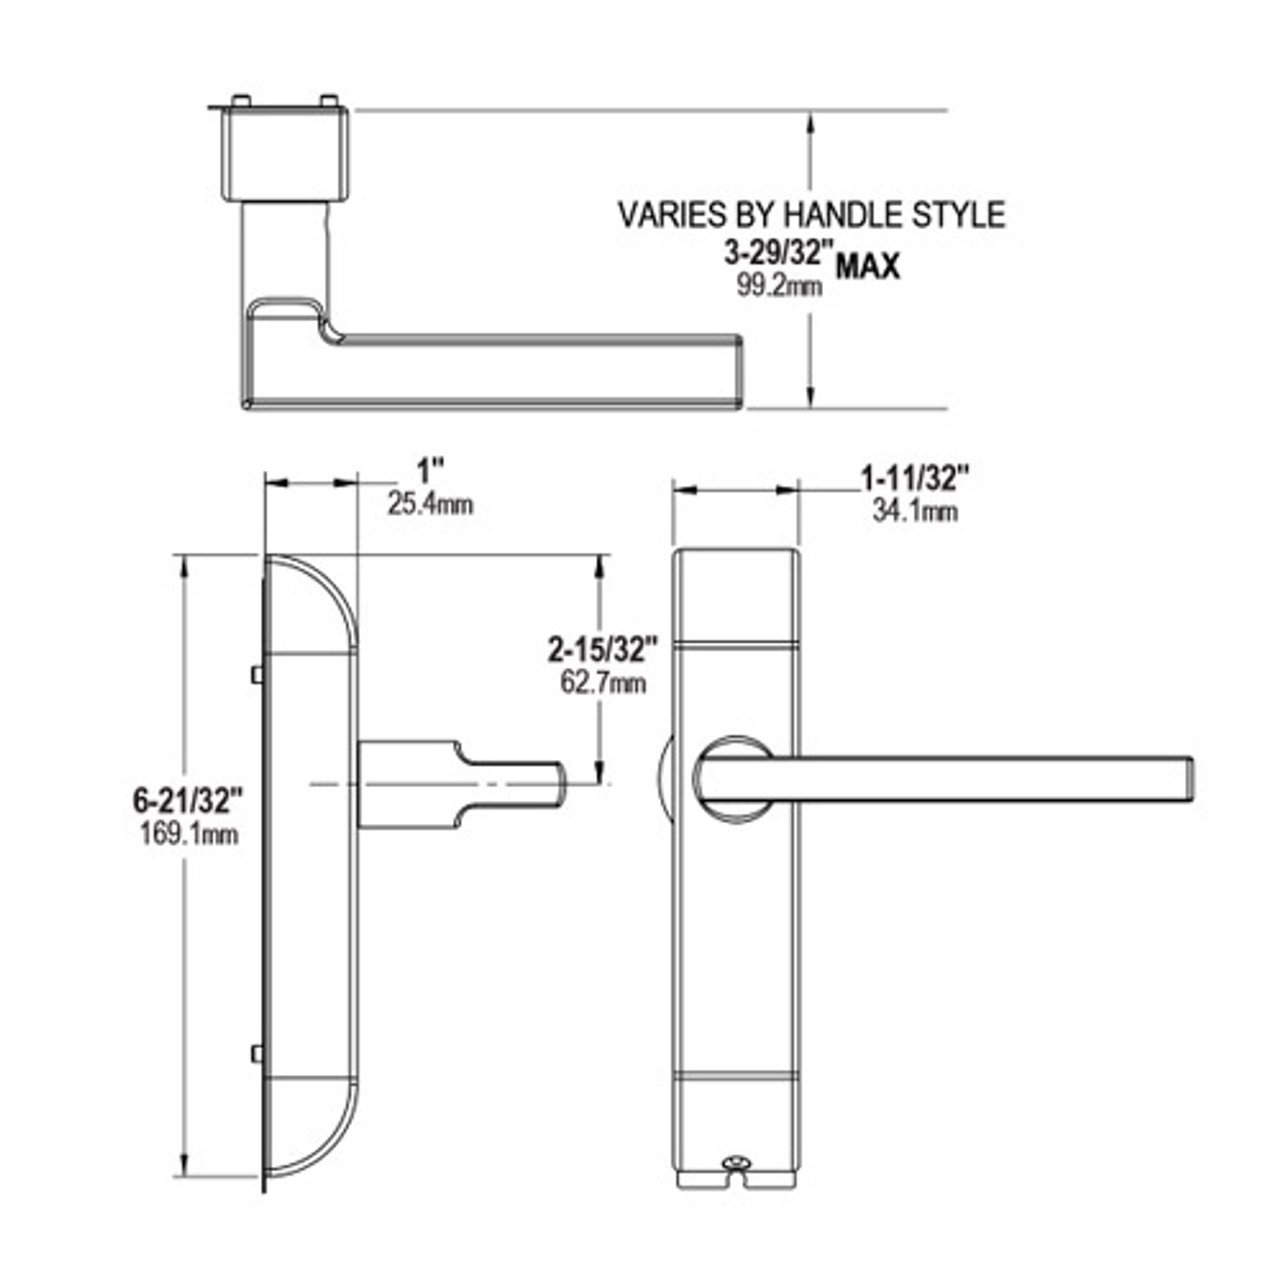 4600-MI-511-US4 Adams Rite MI Designer handle Dimensional View